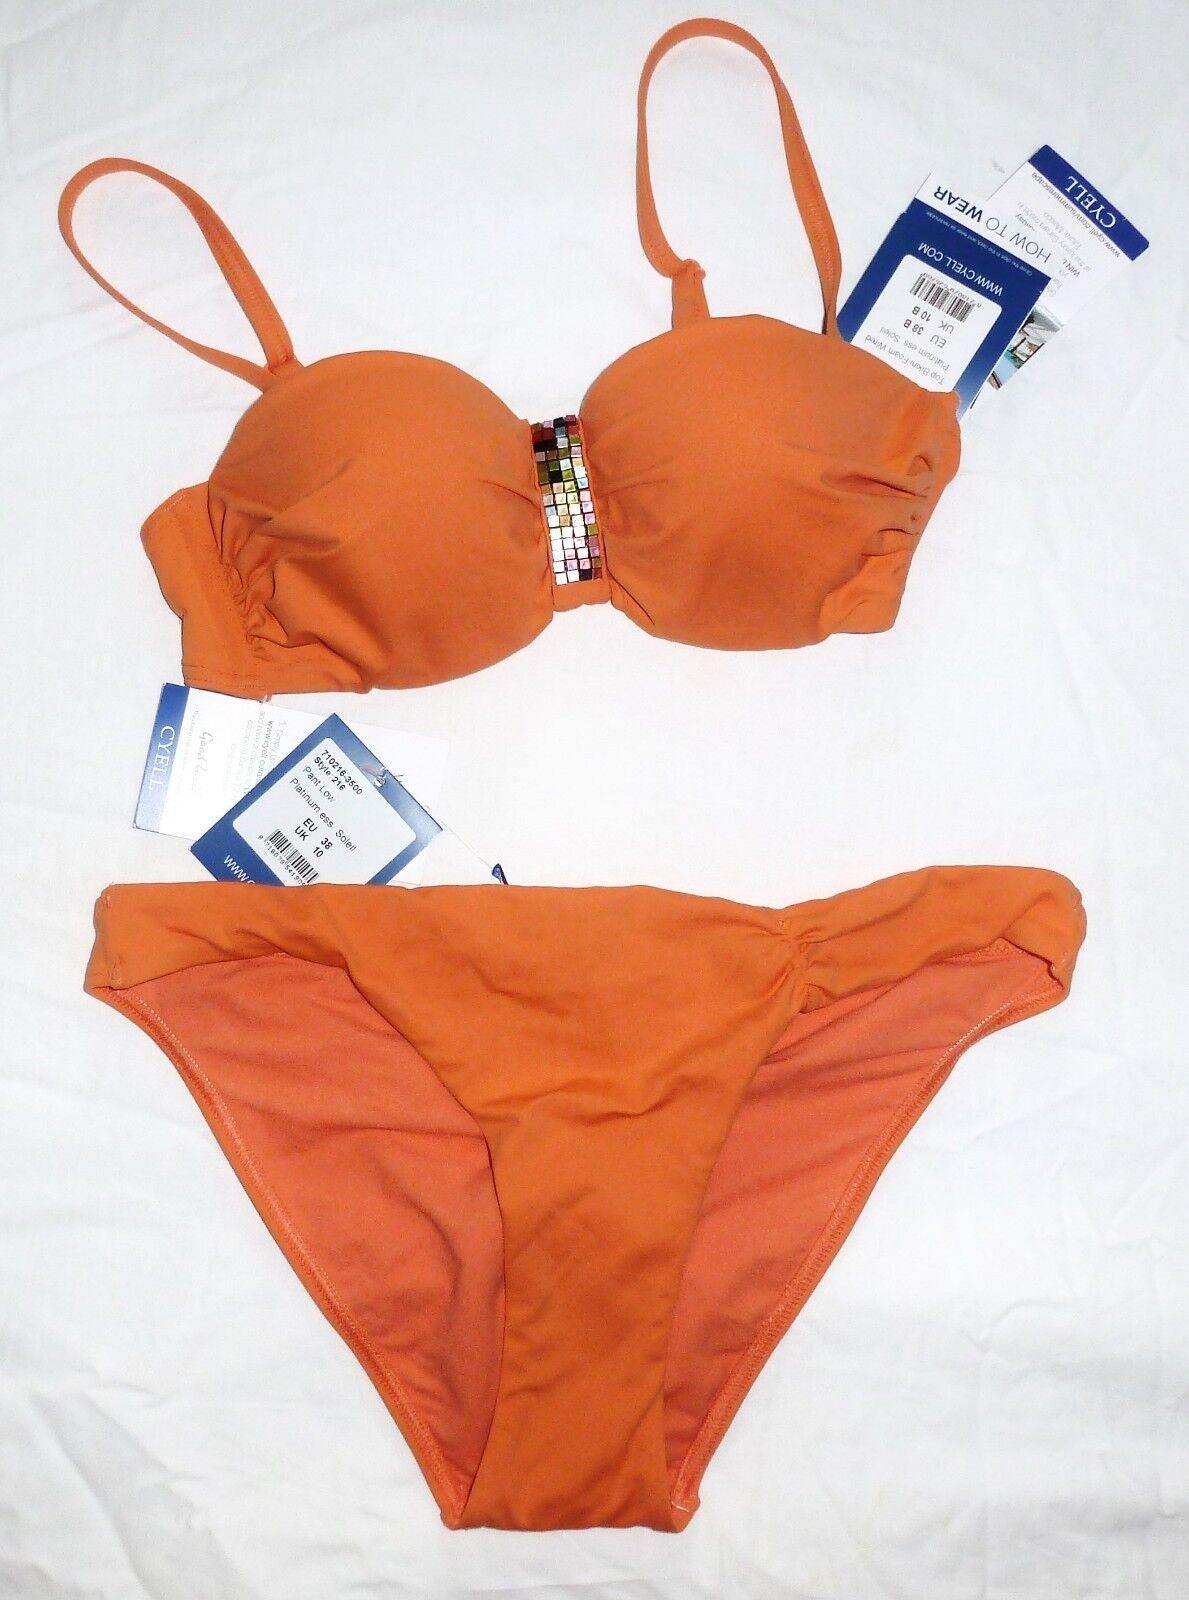 CYELL Platinum Platinum Platinum Ess. Soleil Top Bikini Set 2 Tlg Oberteil & Slip Gr  109 neu | Sofortige Lieferung  | Günstigen Preis  | Viele Stile  | Ermäßigung  | Niedriger Preis  0d4806